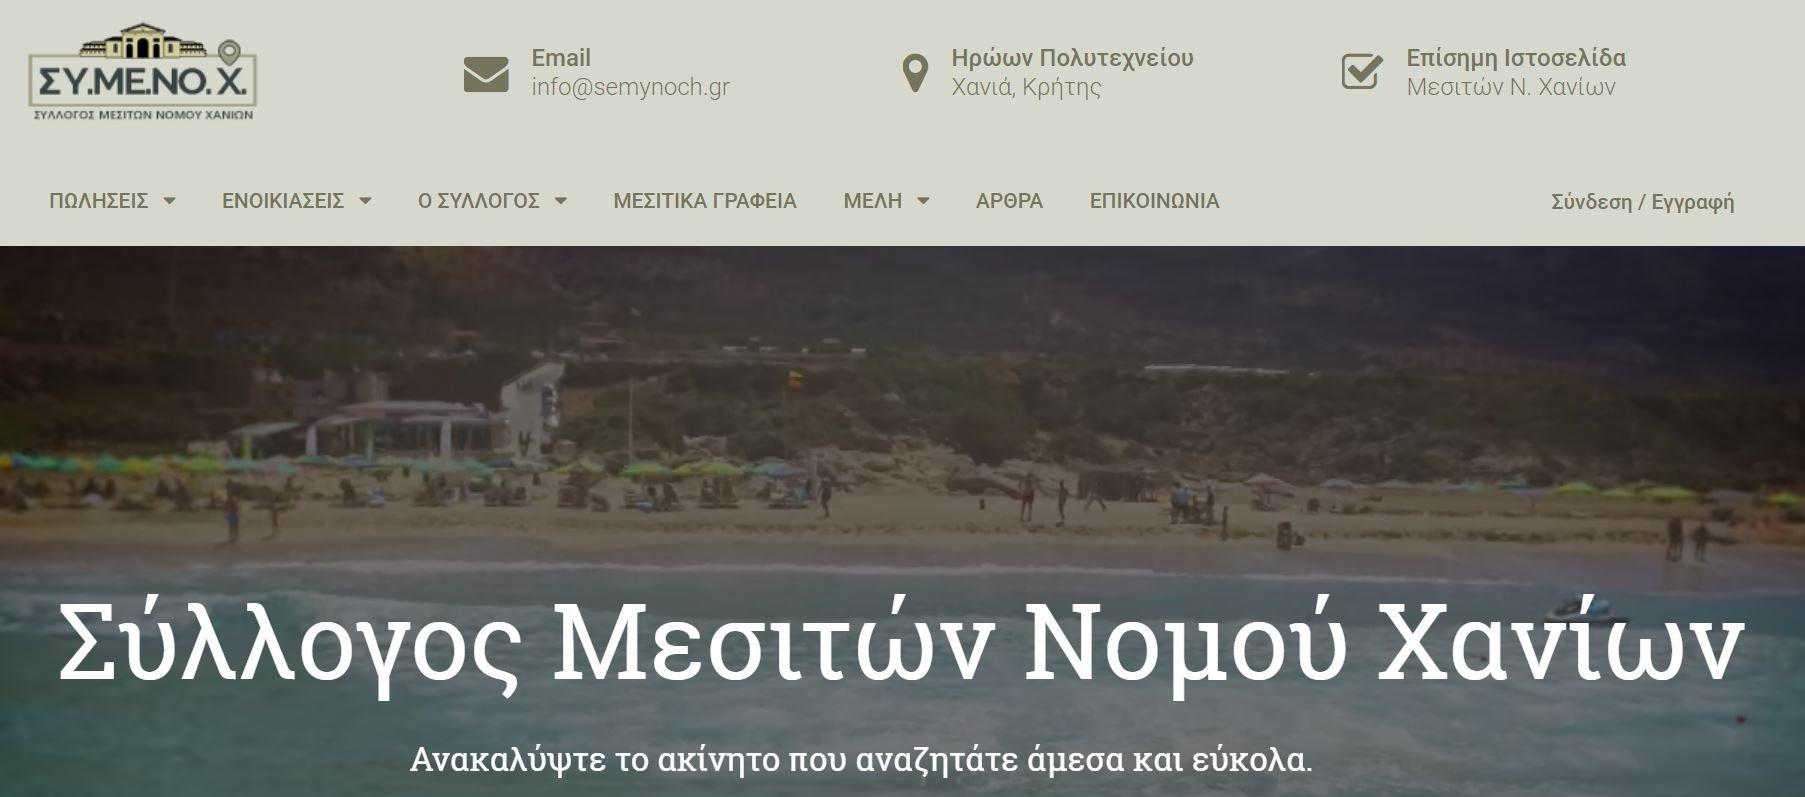 Chania Real Estate Association of realtors - SYMENOCH